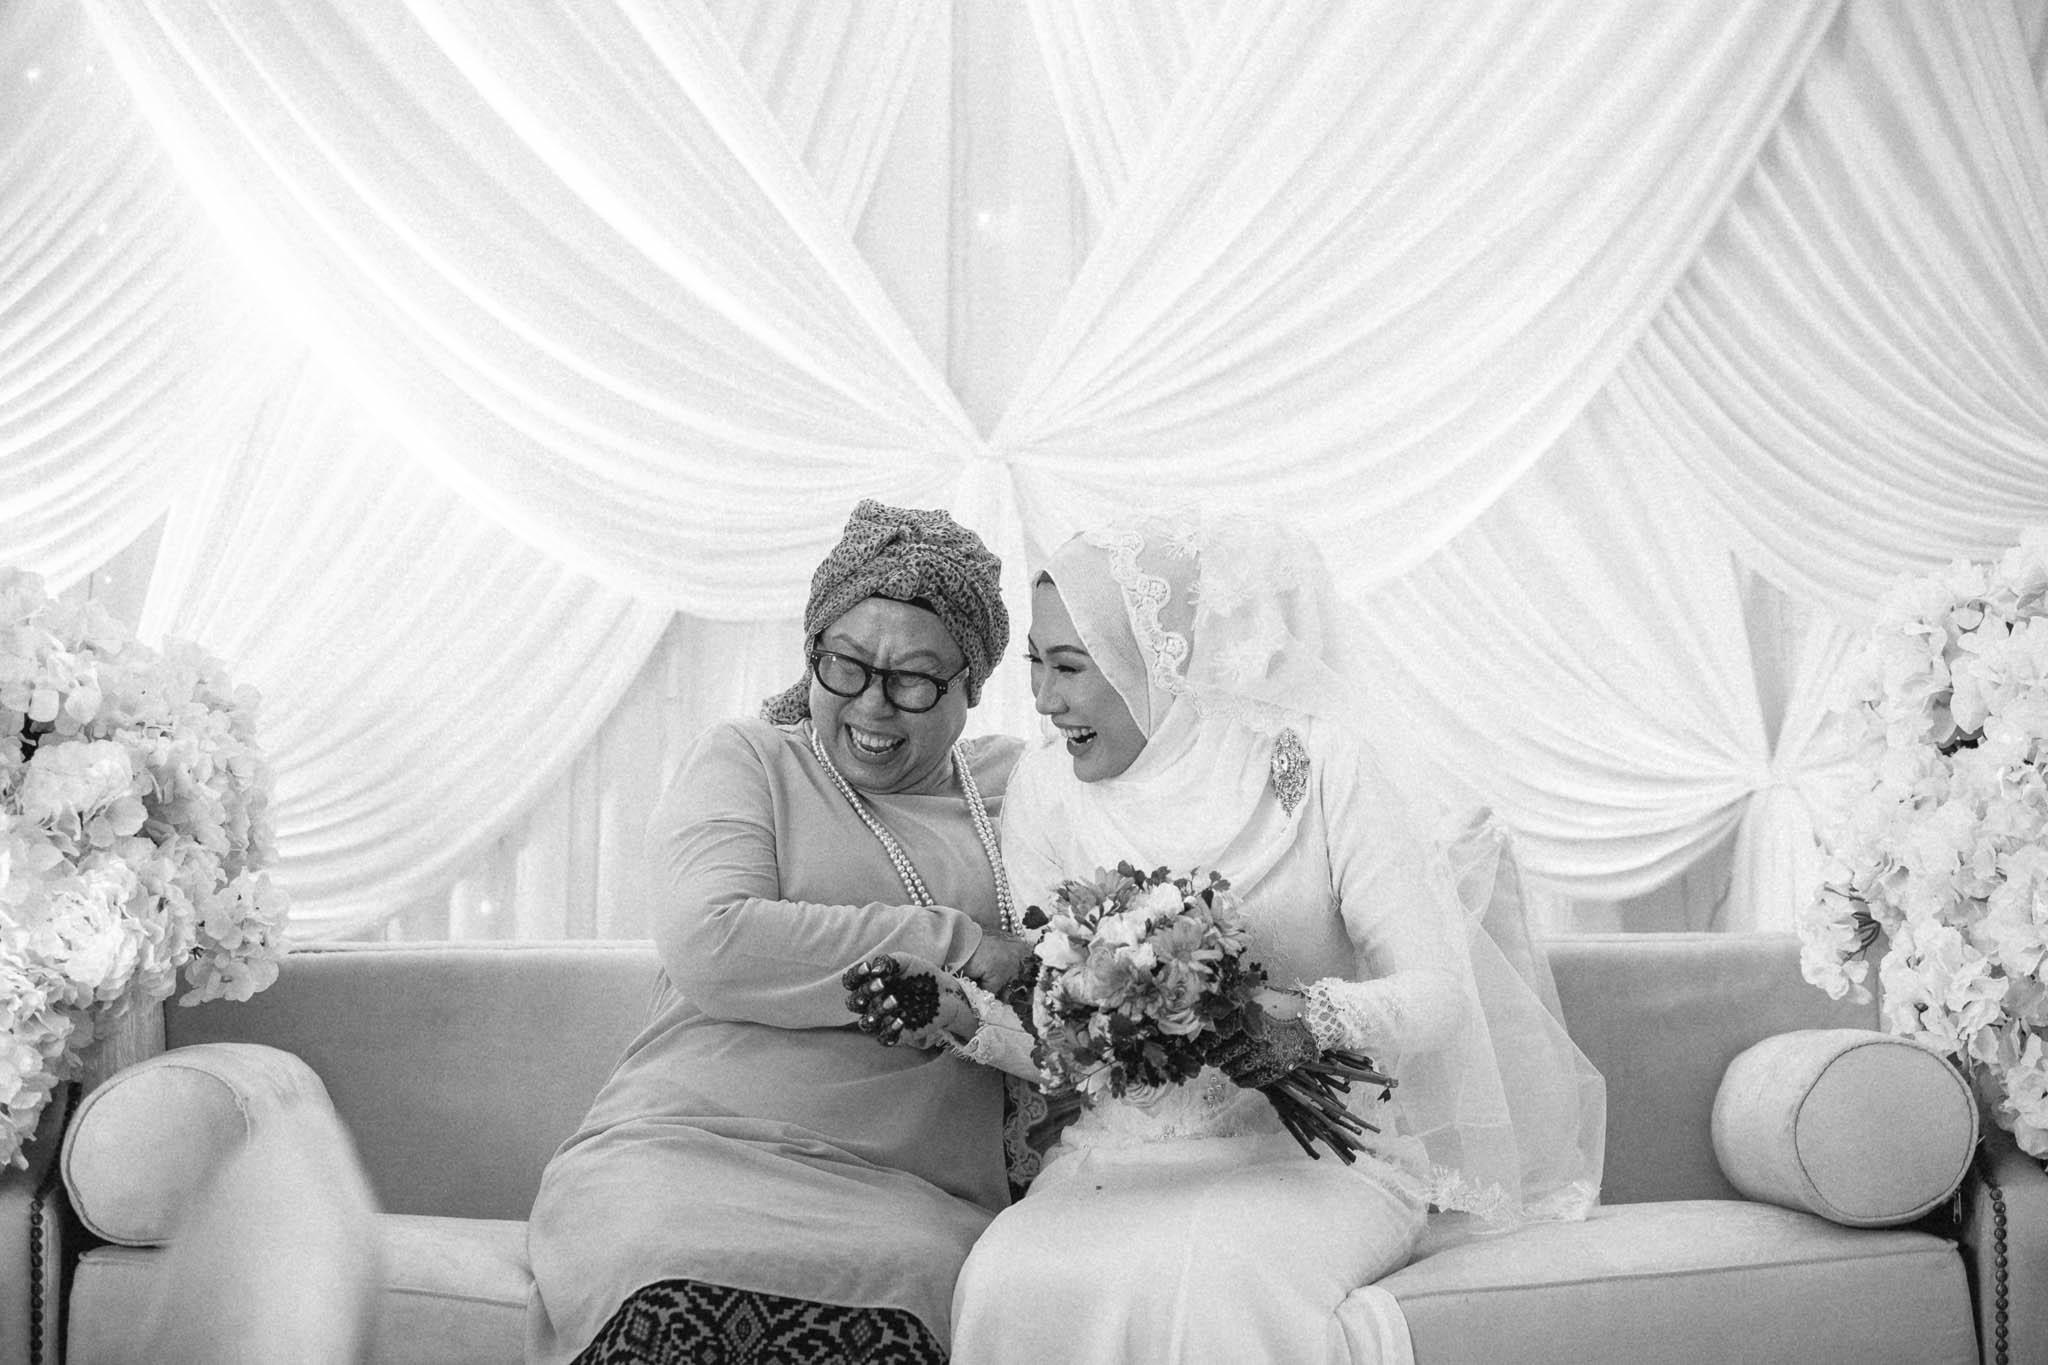 singapore-wedding-photographer-wedding-nufail-addafiq-019.jpg